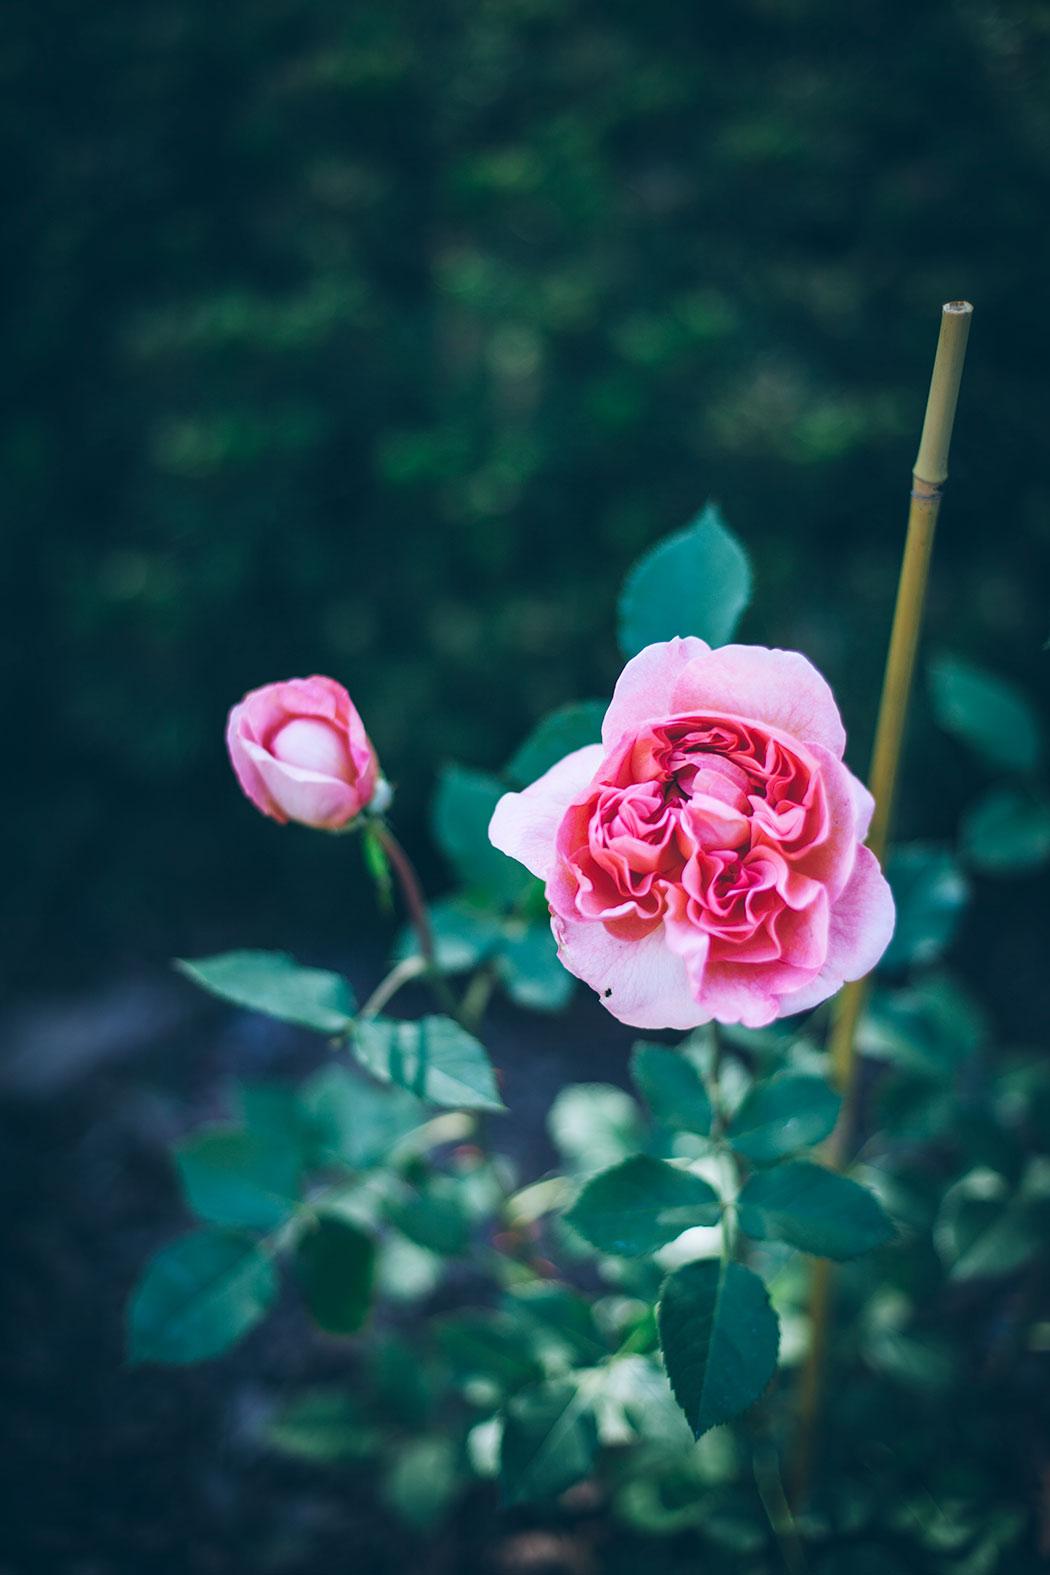 boscobel-roza